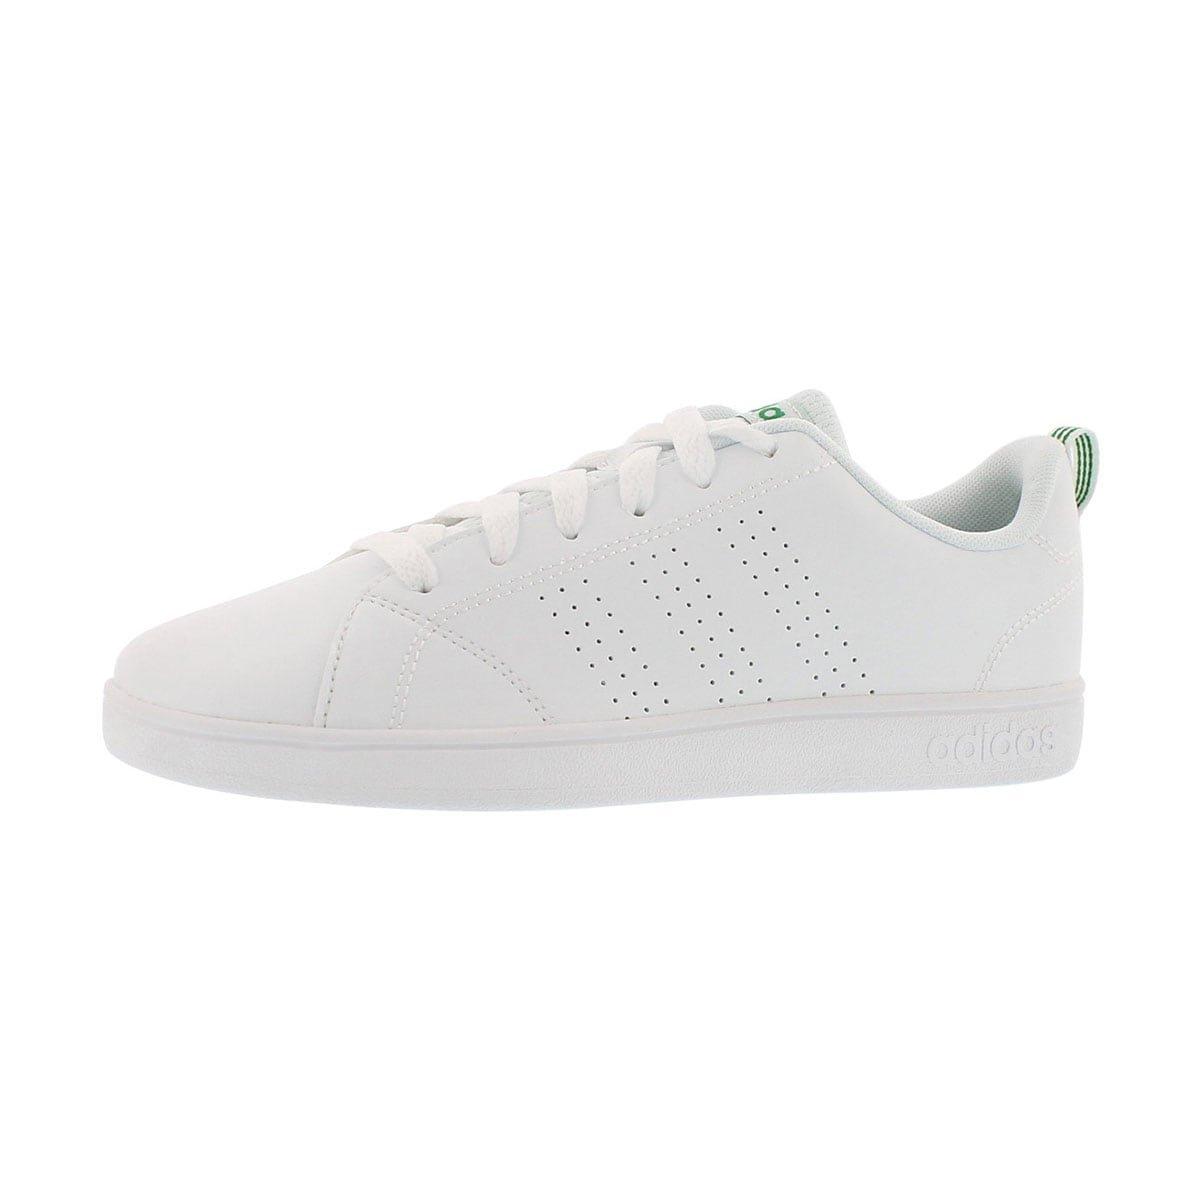 adidas Kids' VS Advantage Clean Sneaker, White/White/Green, 5 M US Big Kid